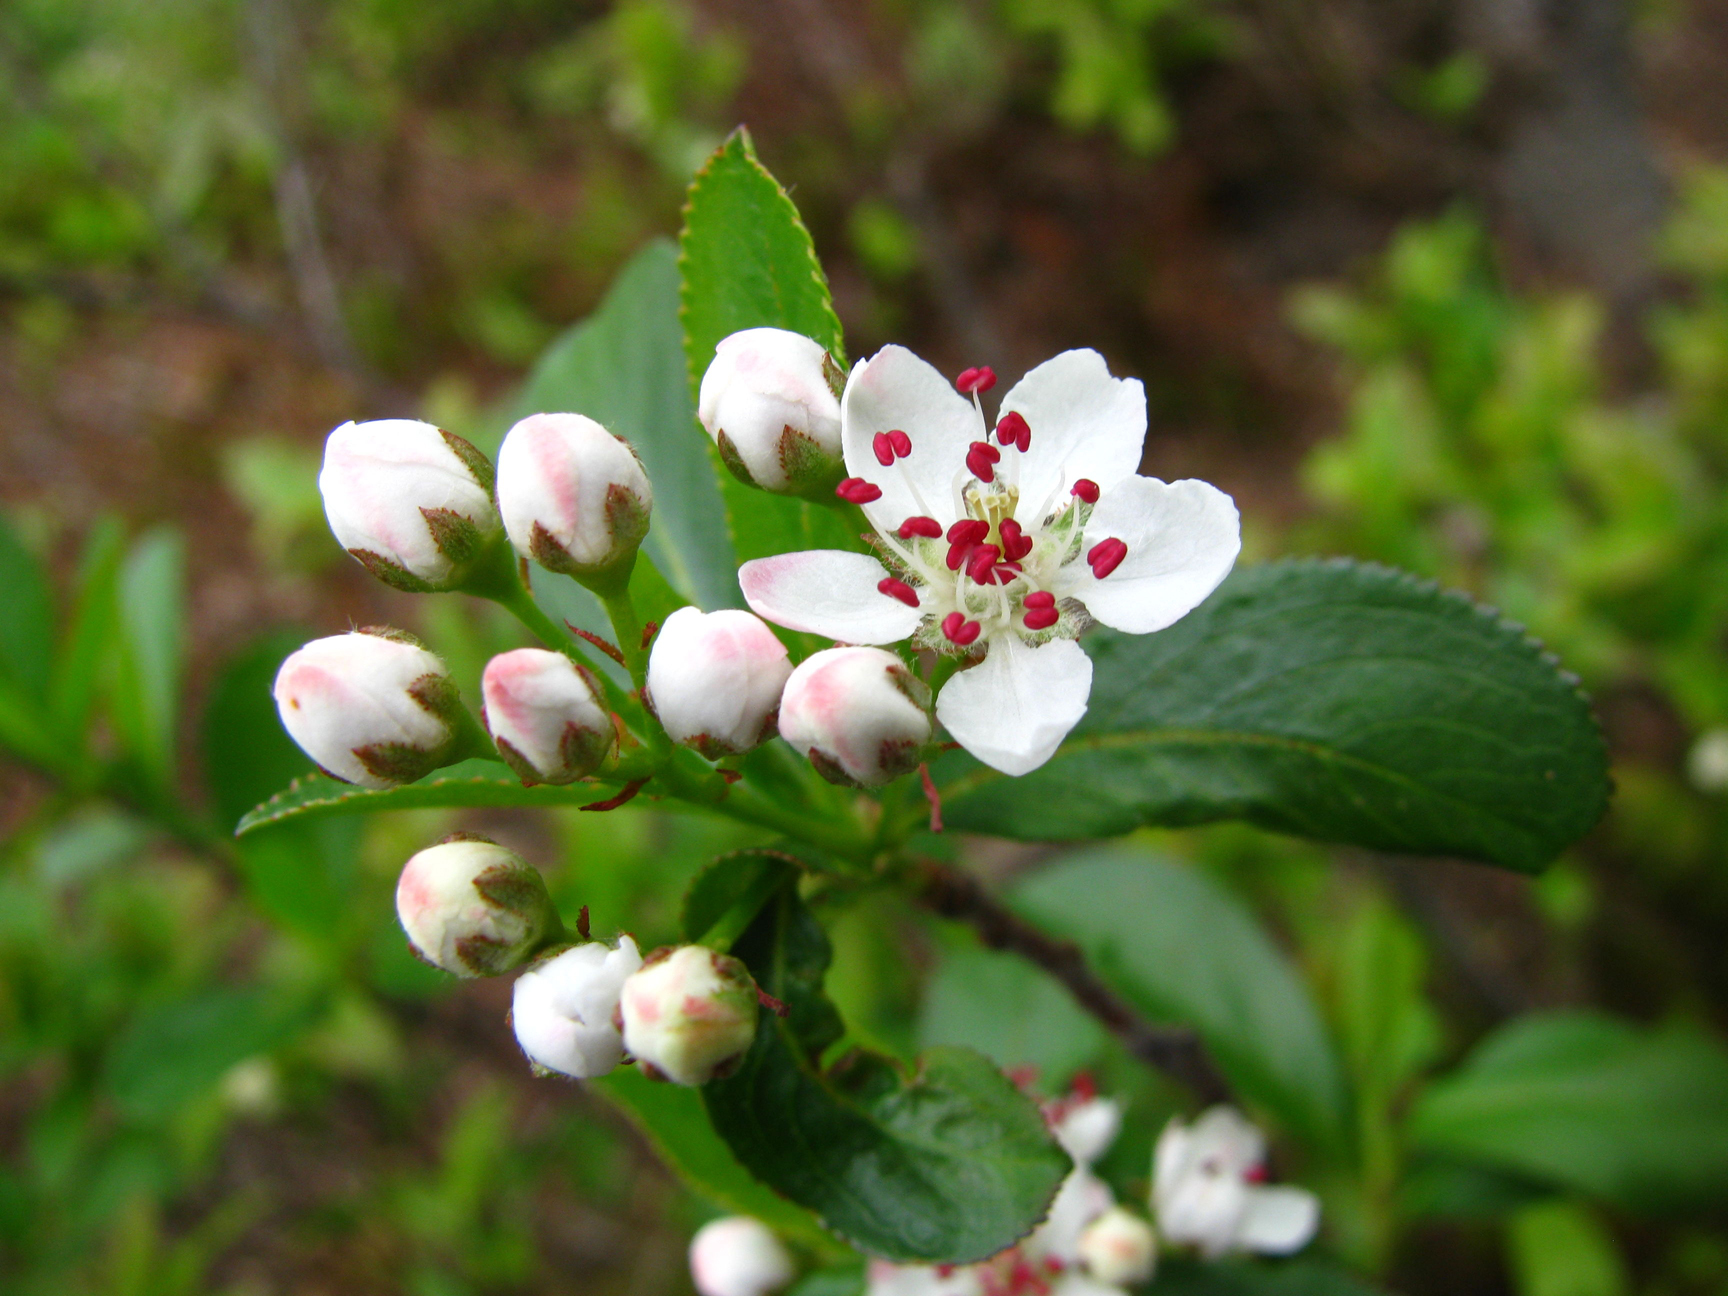 Chokeberry-flower-buds